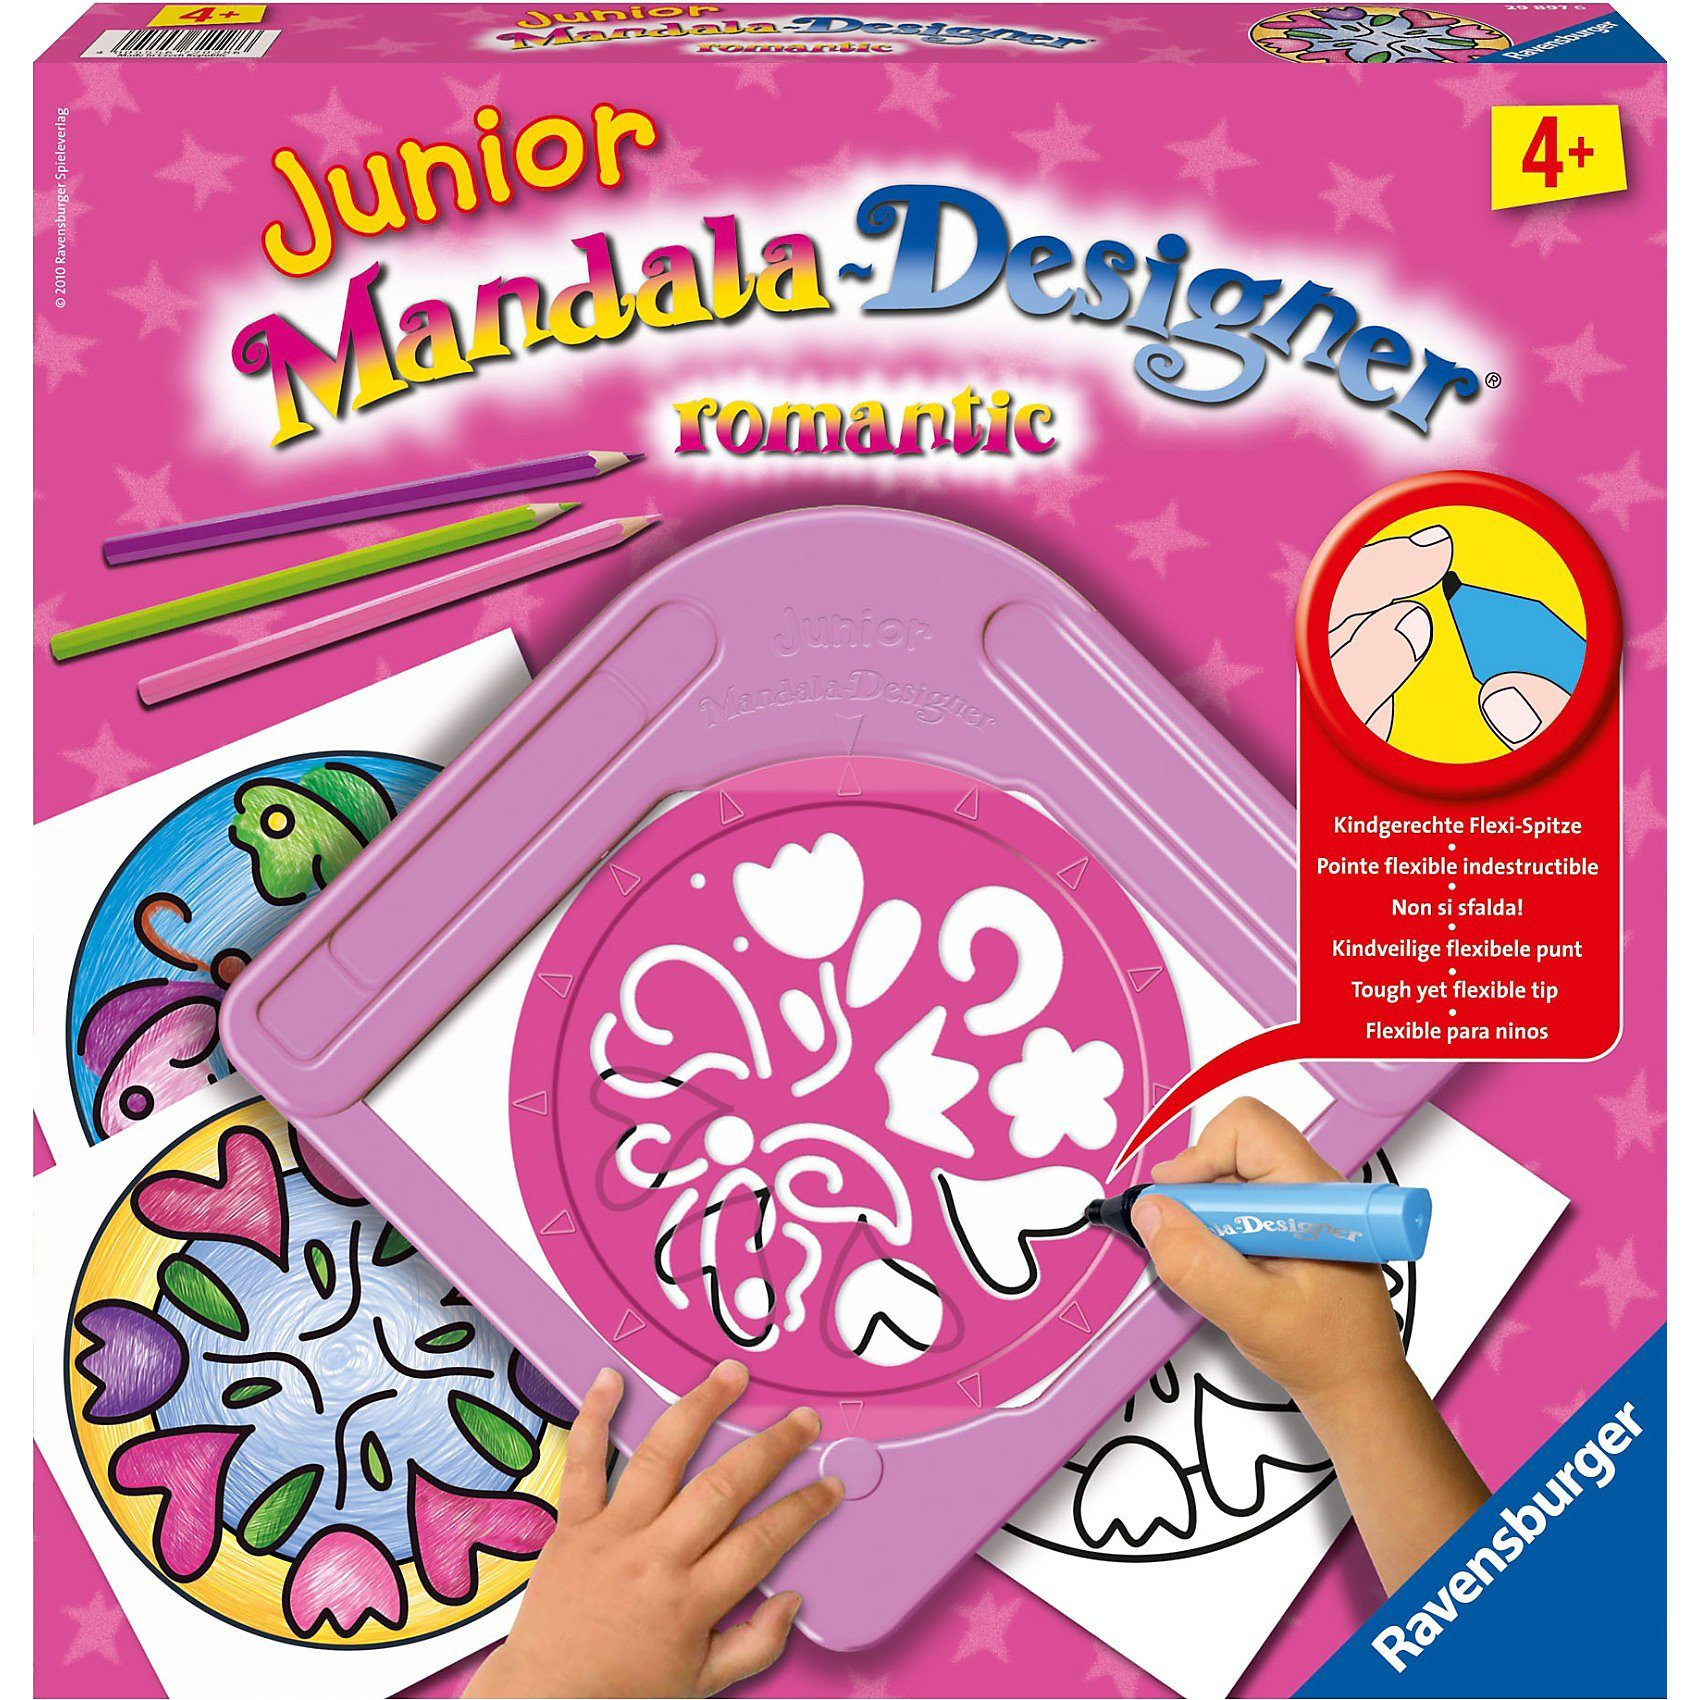 Ravensburger Junior Mandala Designer® romantic